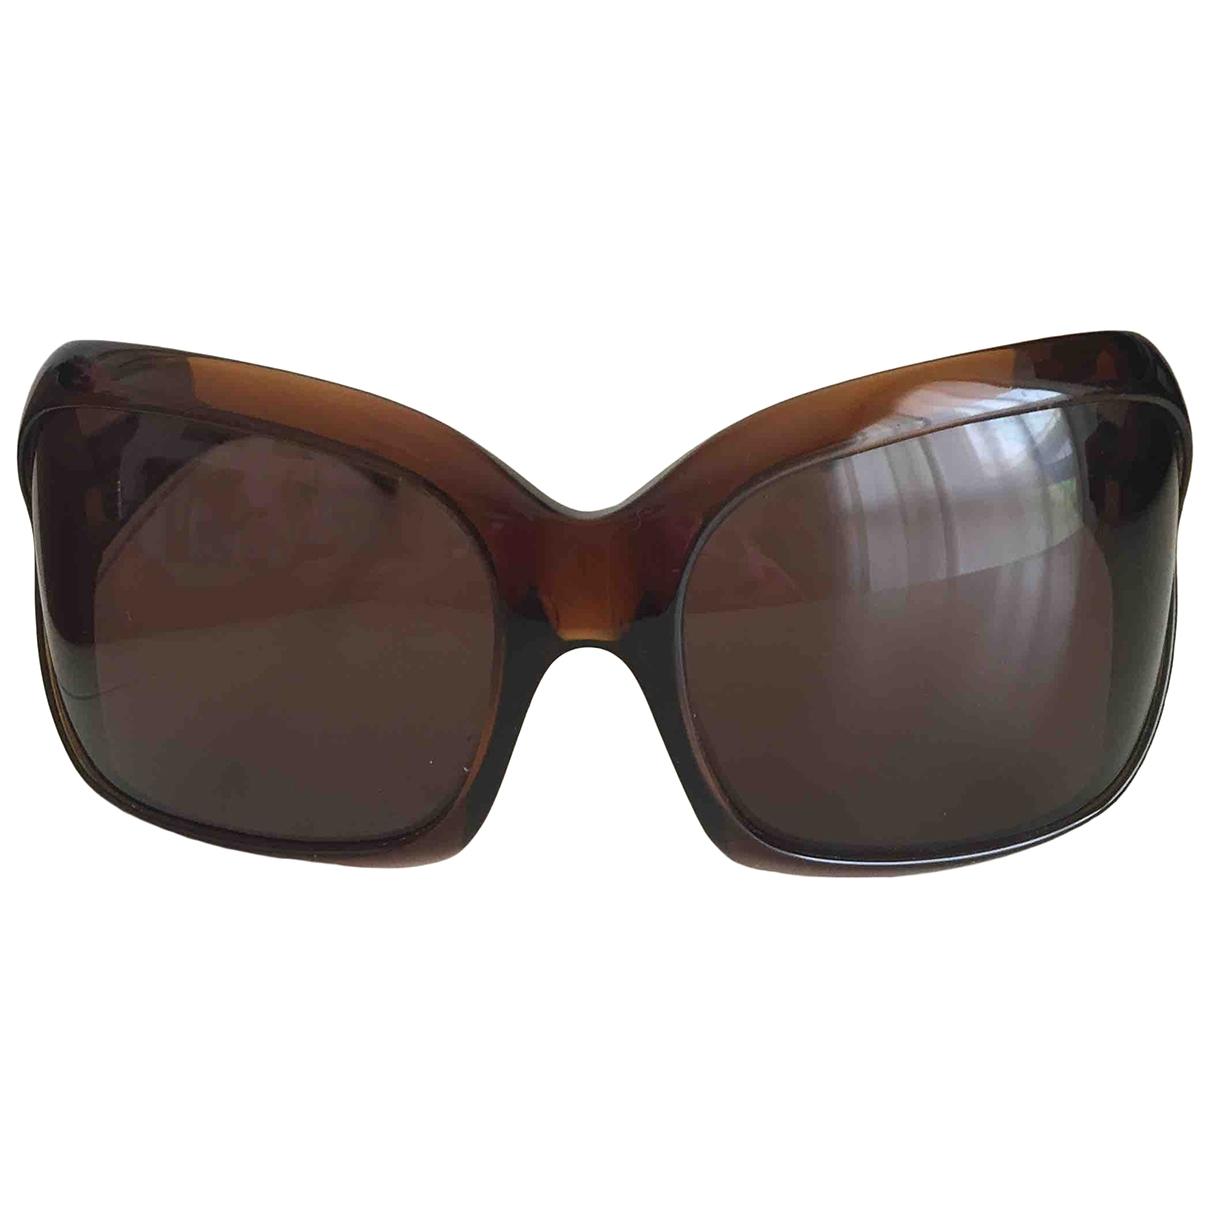 Gafas mascara Roberto Cavalli